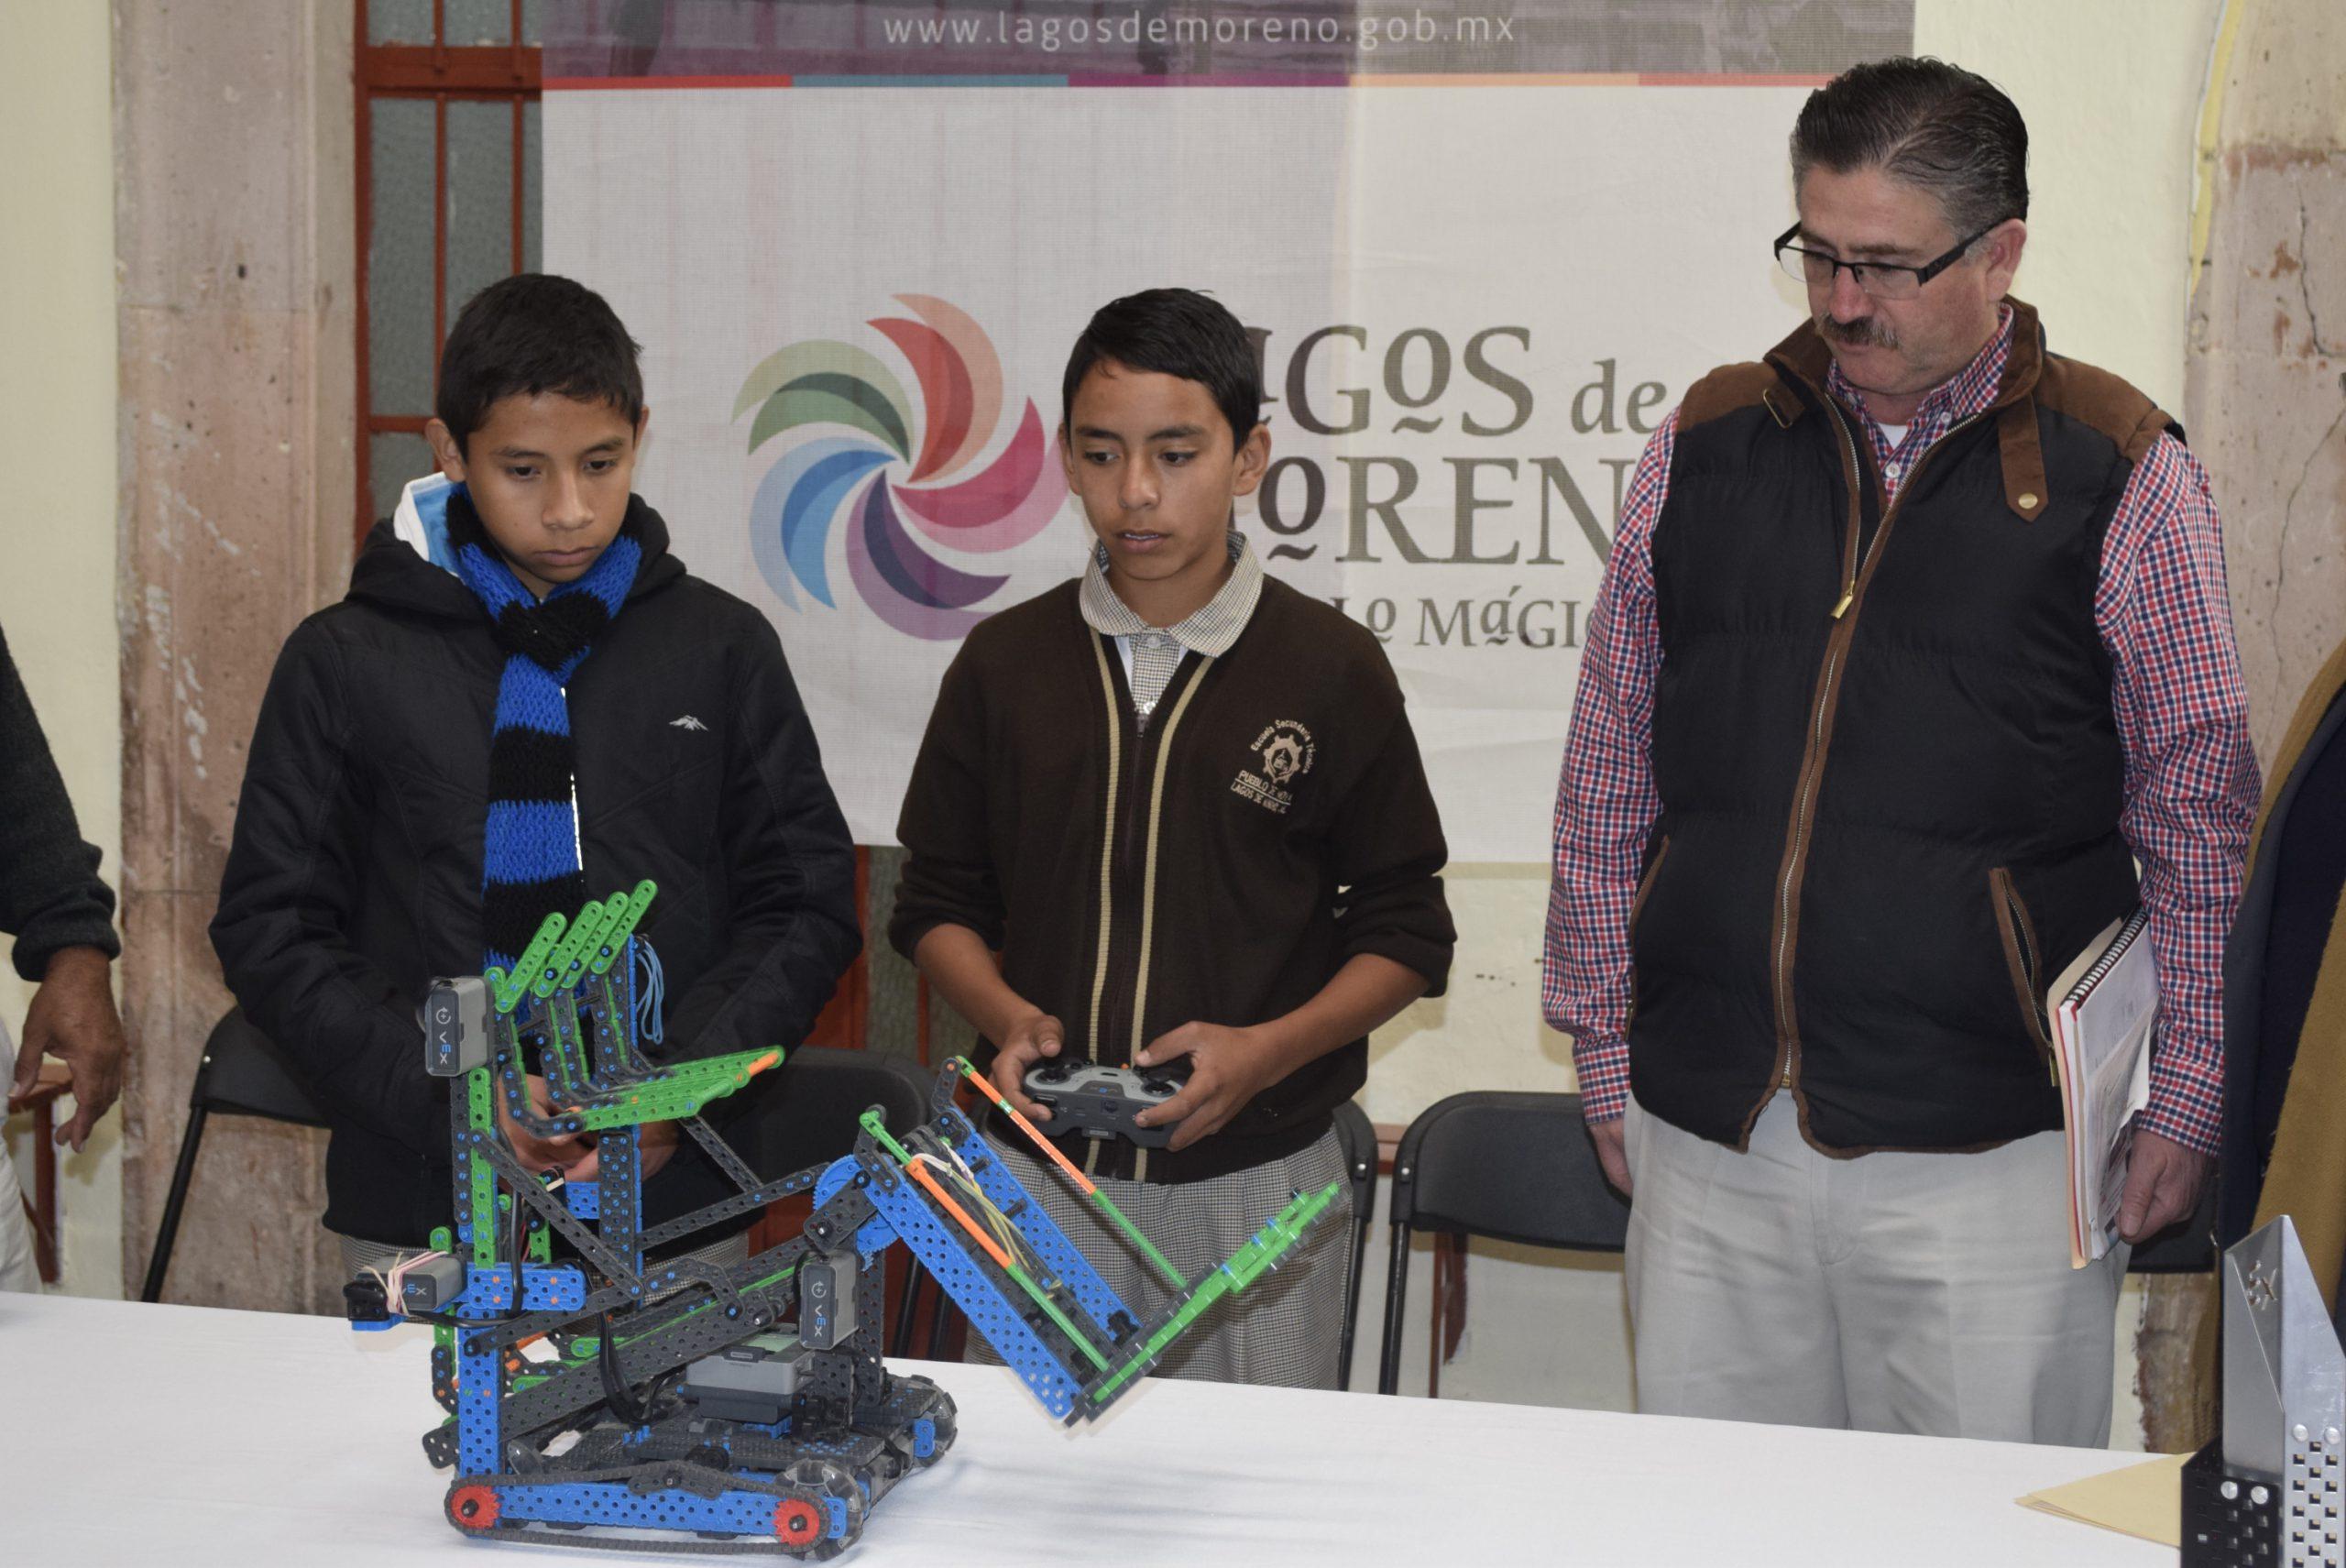 Photo of Apoyará Alcalde a equipo de robótica